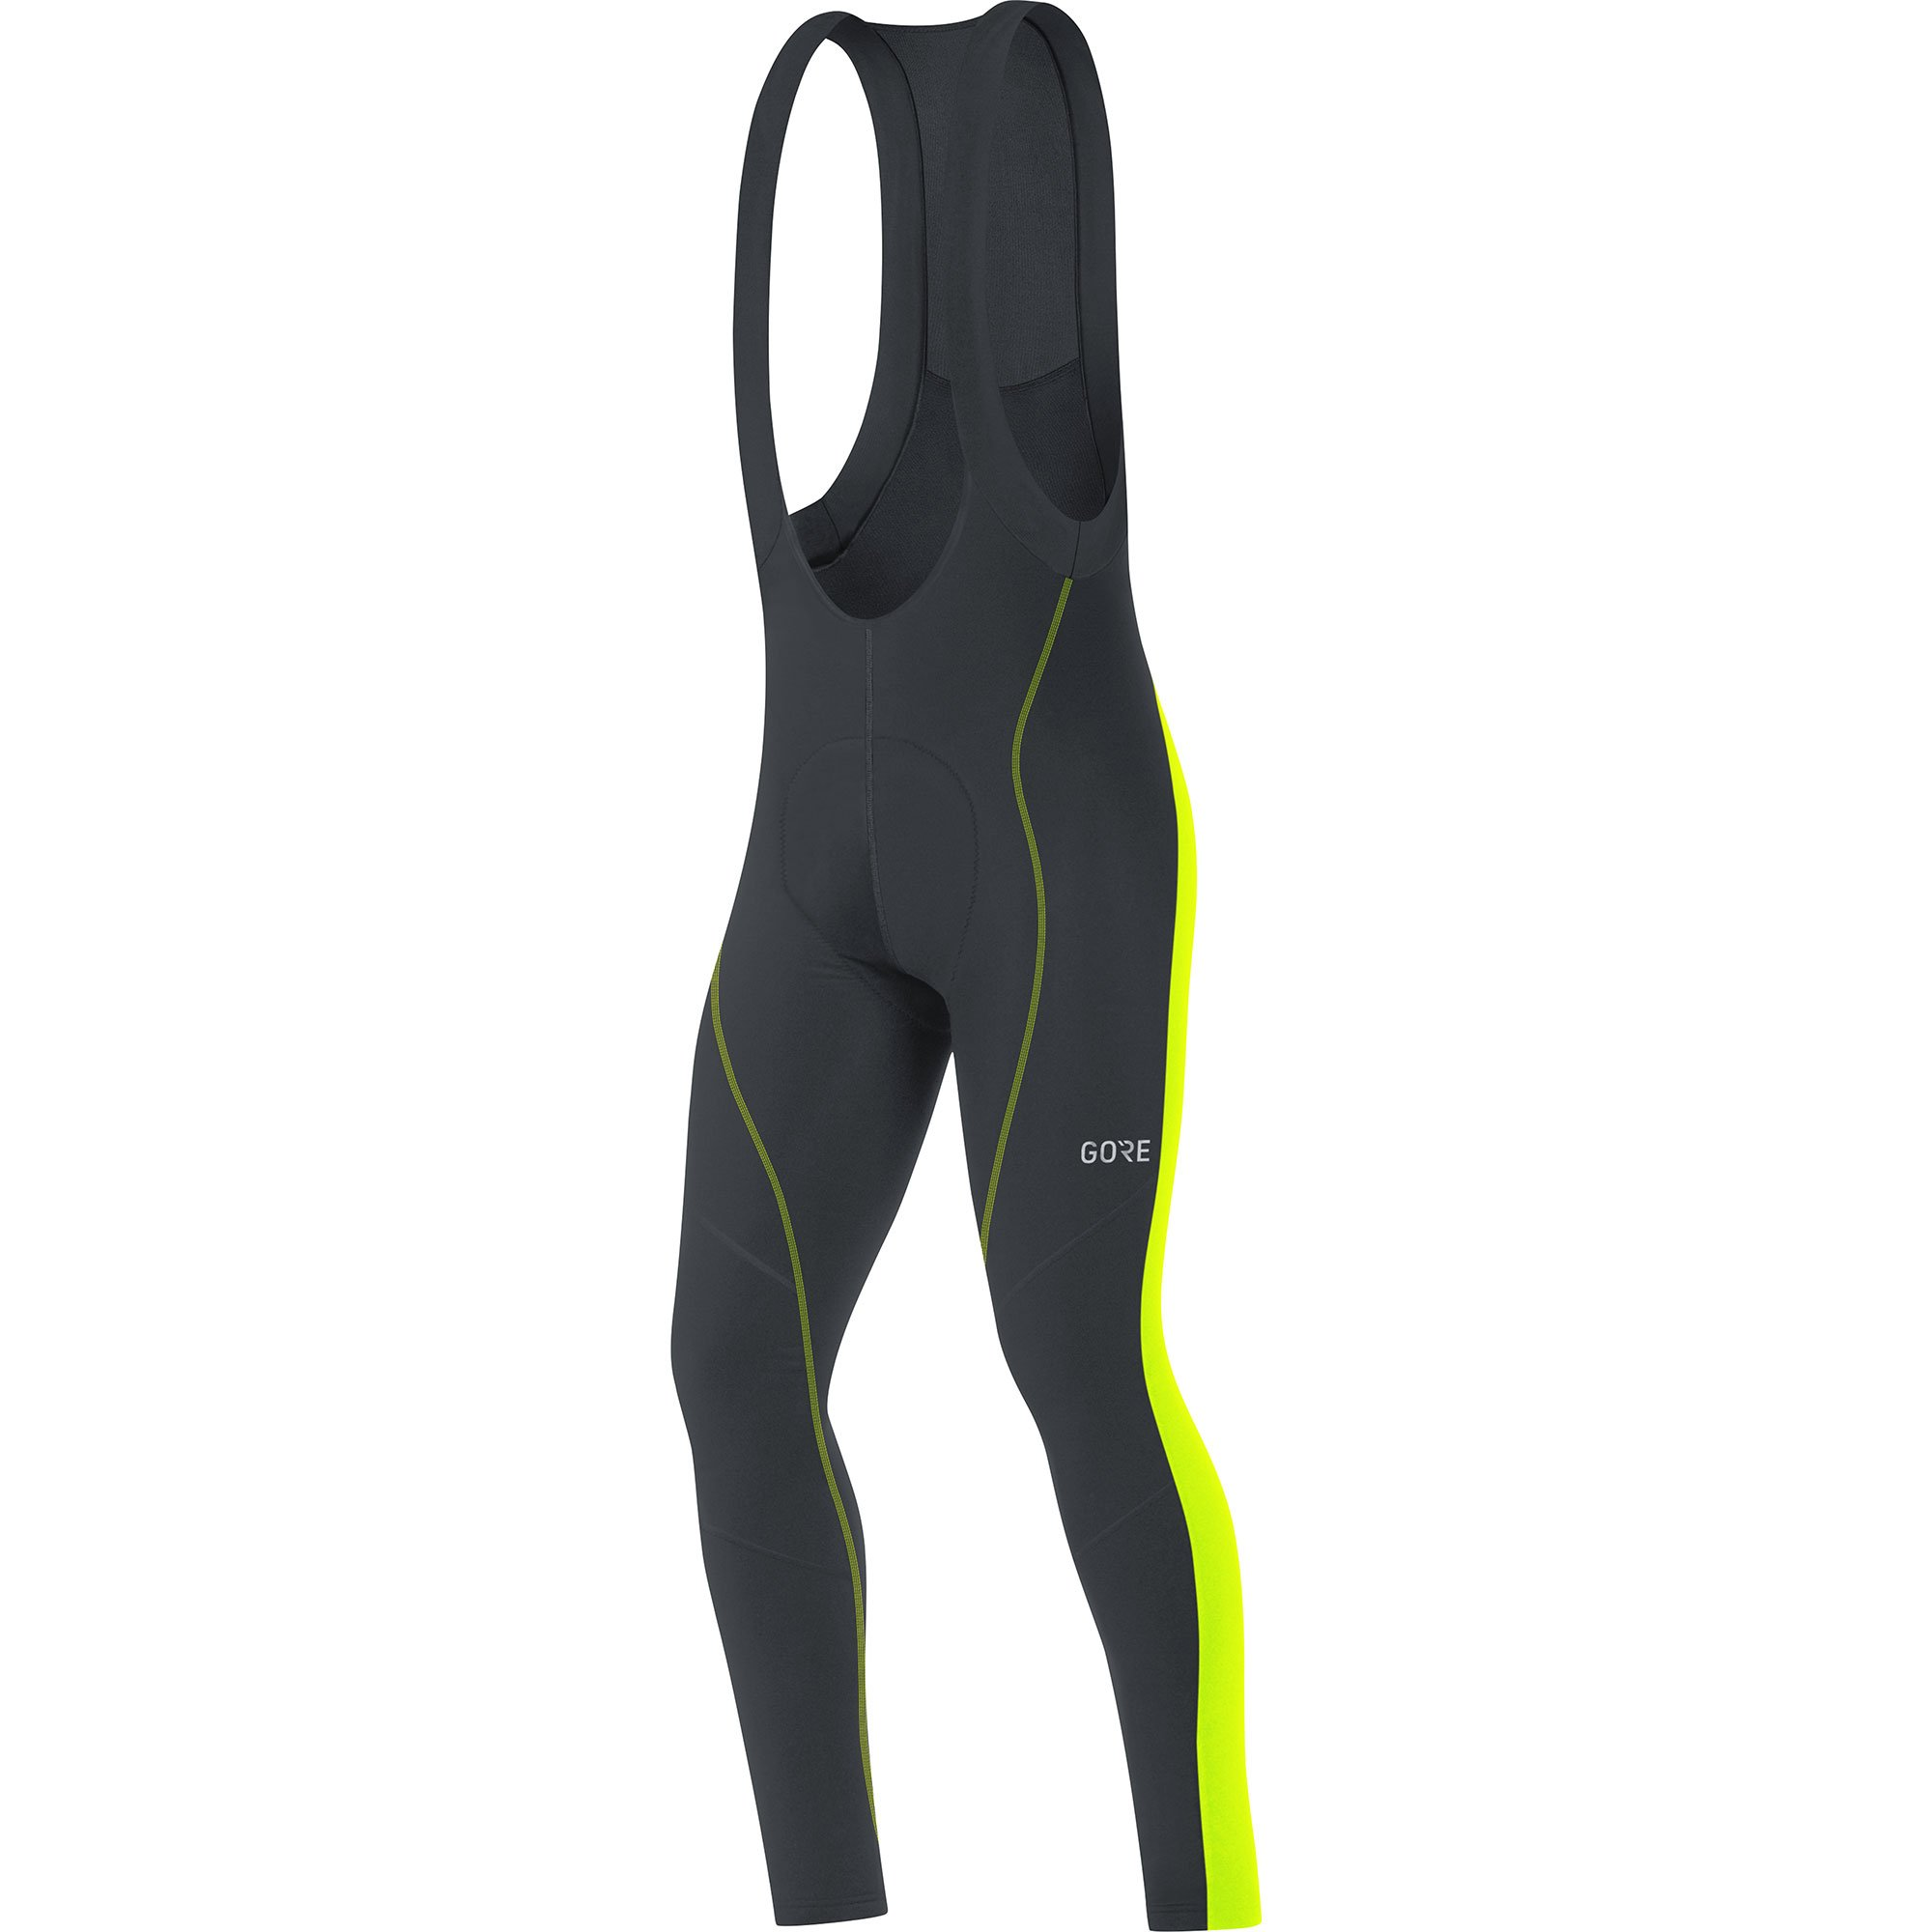 Gore Men's C3 Thermo Bib Tights+, Black/neon Yellow, S